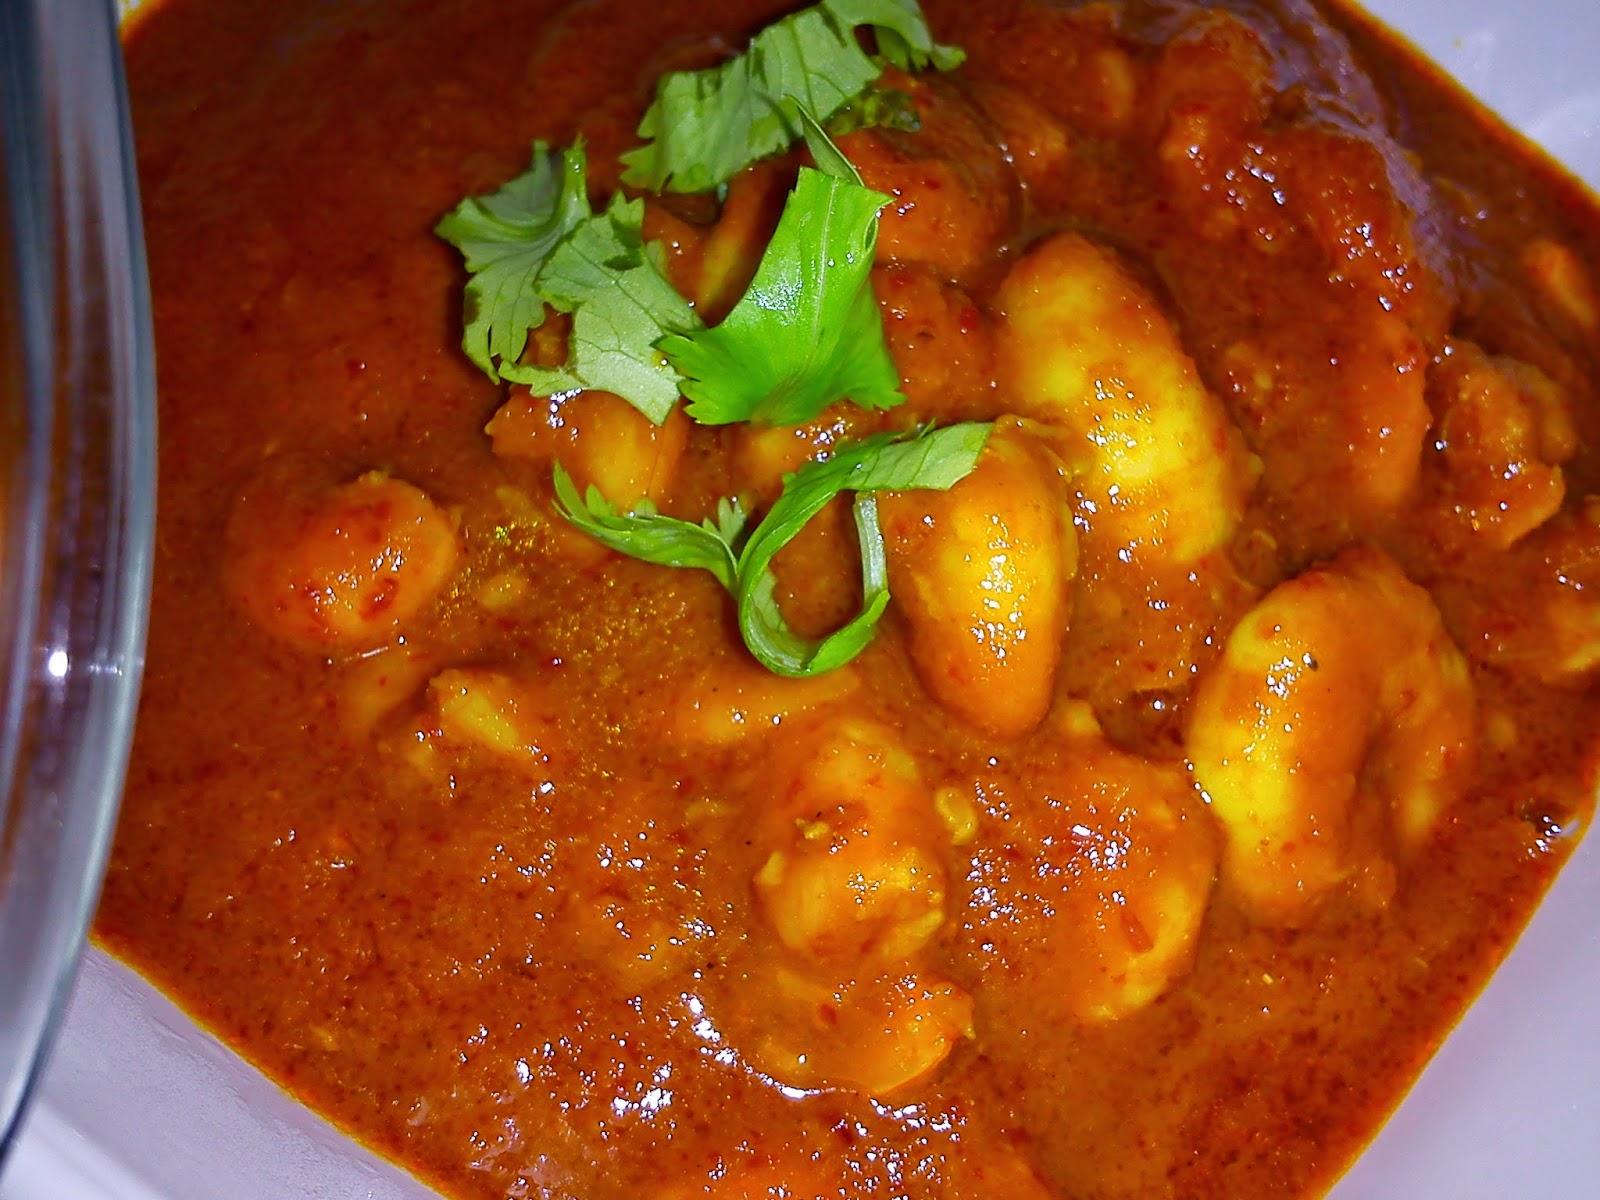 Cooking Pleasure: NYONYA SAMBAL UDANG [PRAWN SAMBAL]